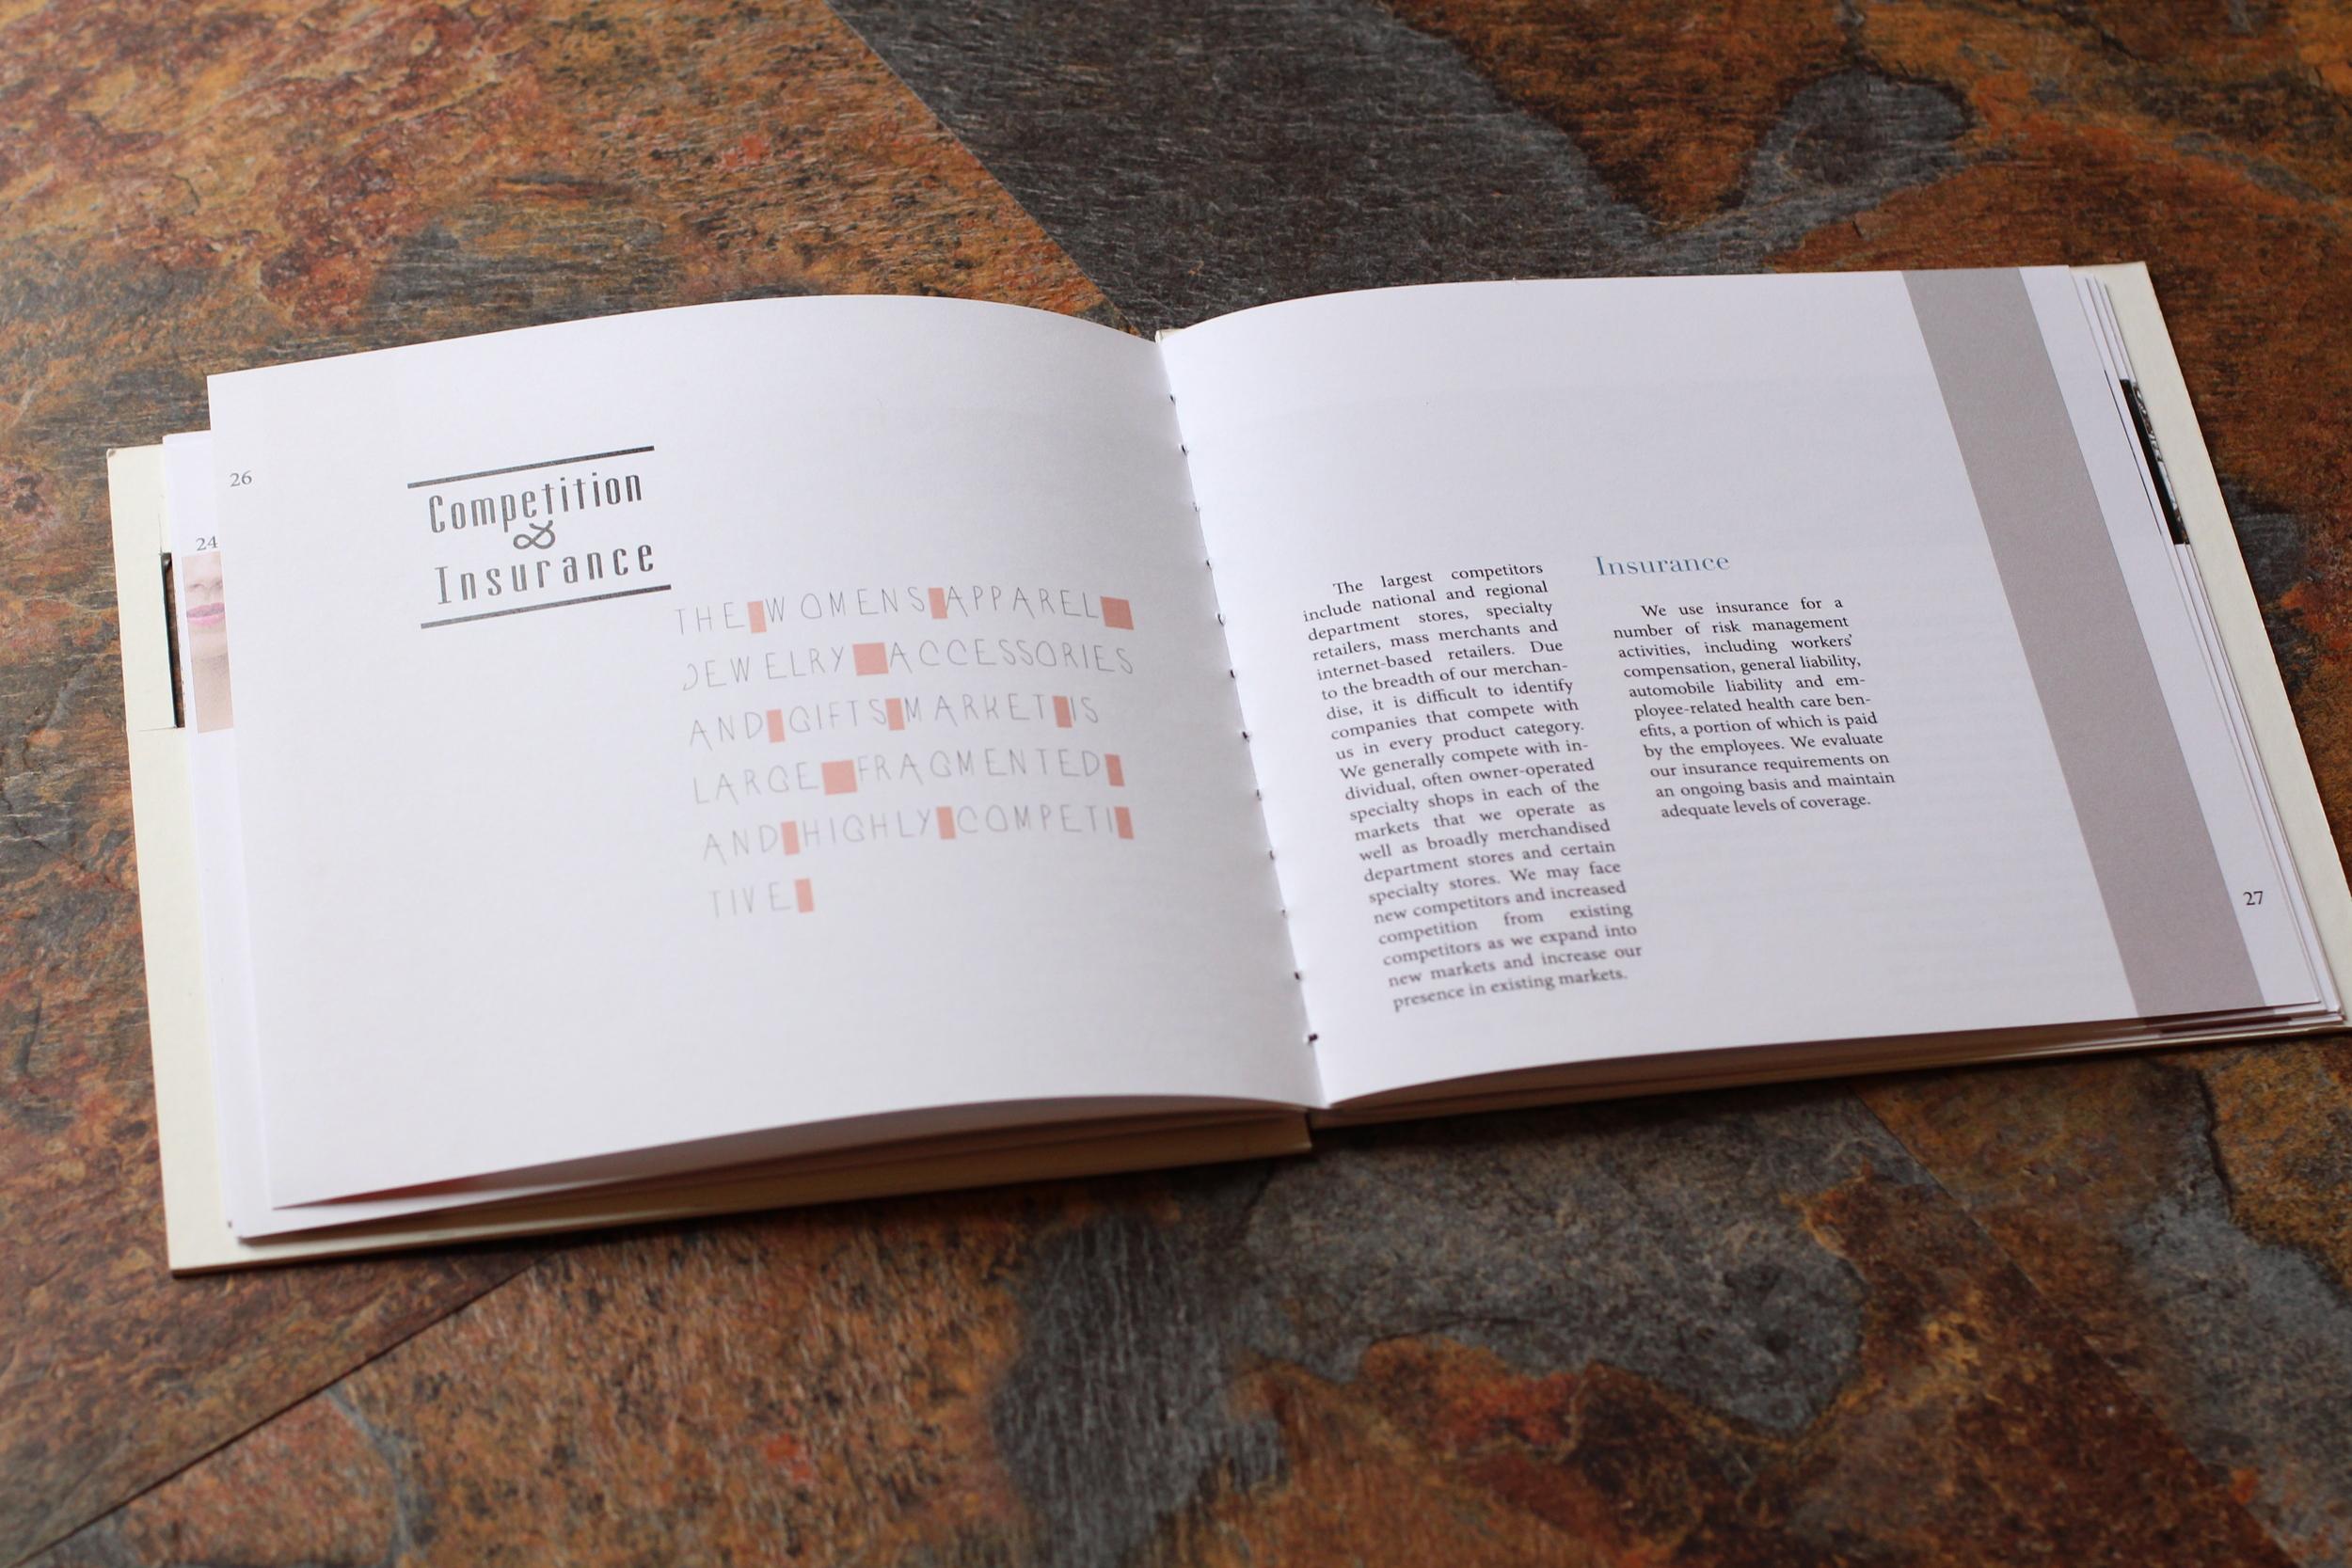 francesca's_annual_report_melanie_celeste_6.JPG